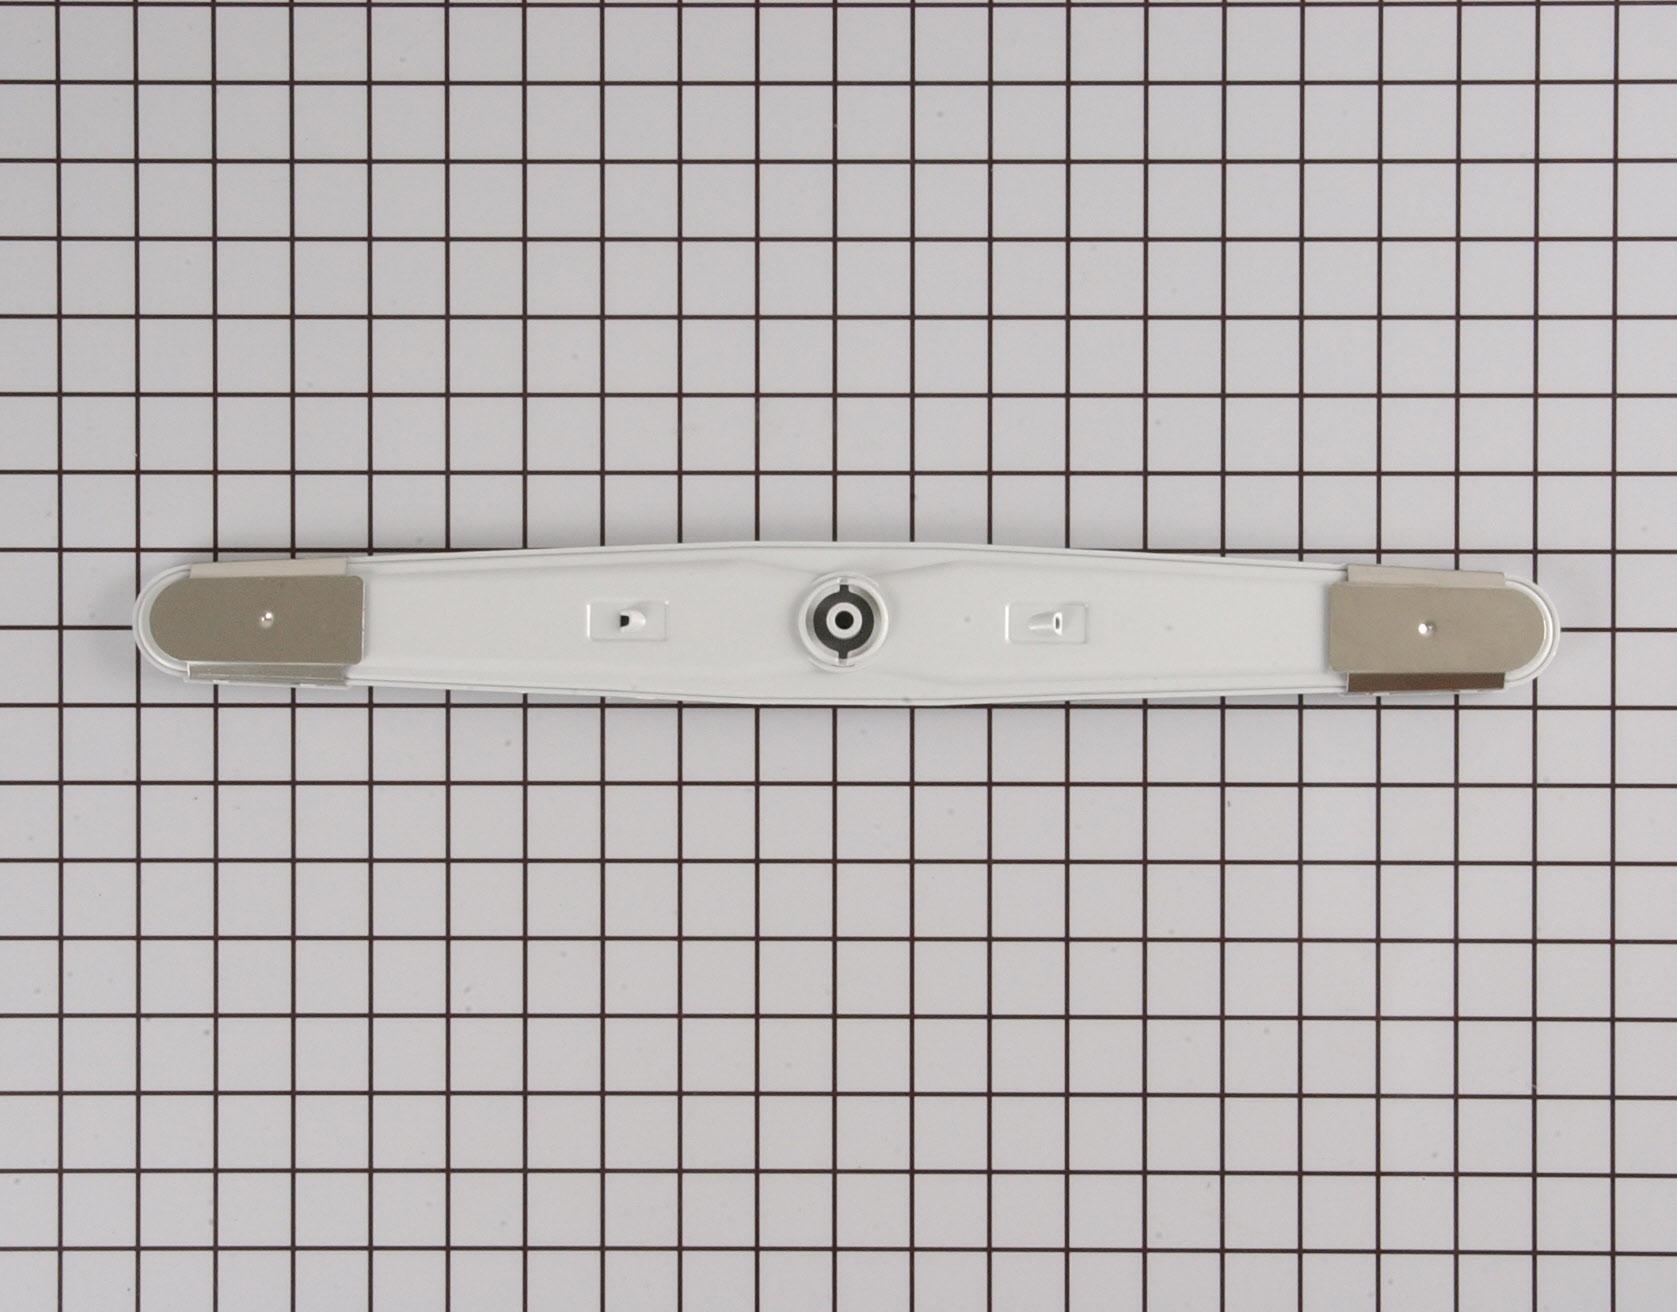 WP6-917642 Crosley Dishwasher Part -Lower Wash Arm Assembly